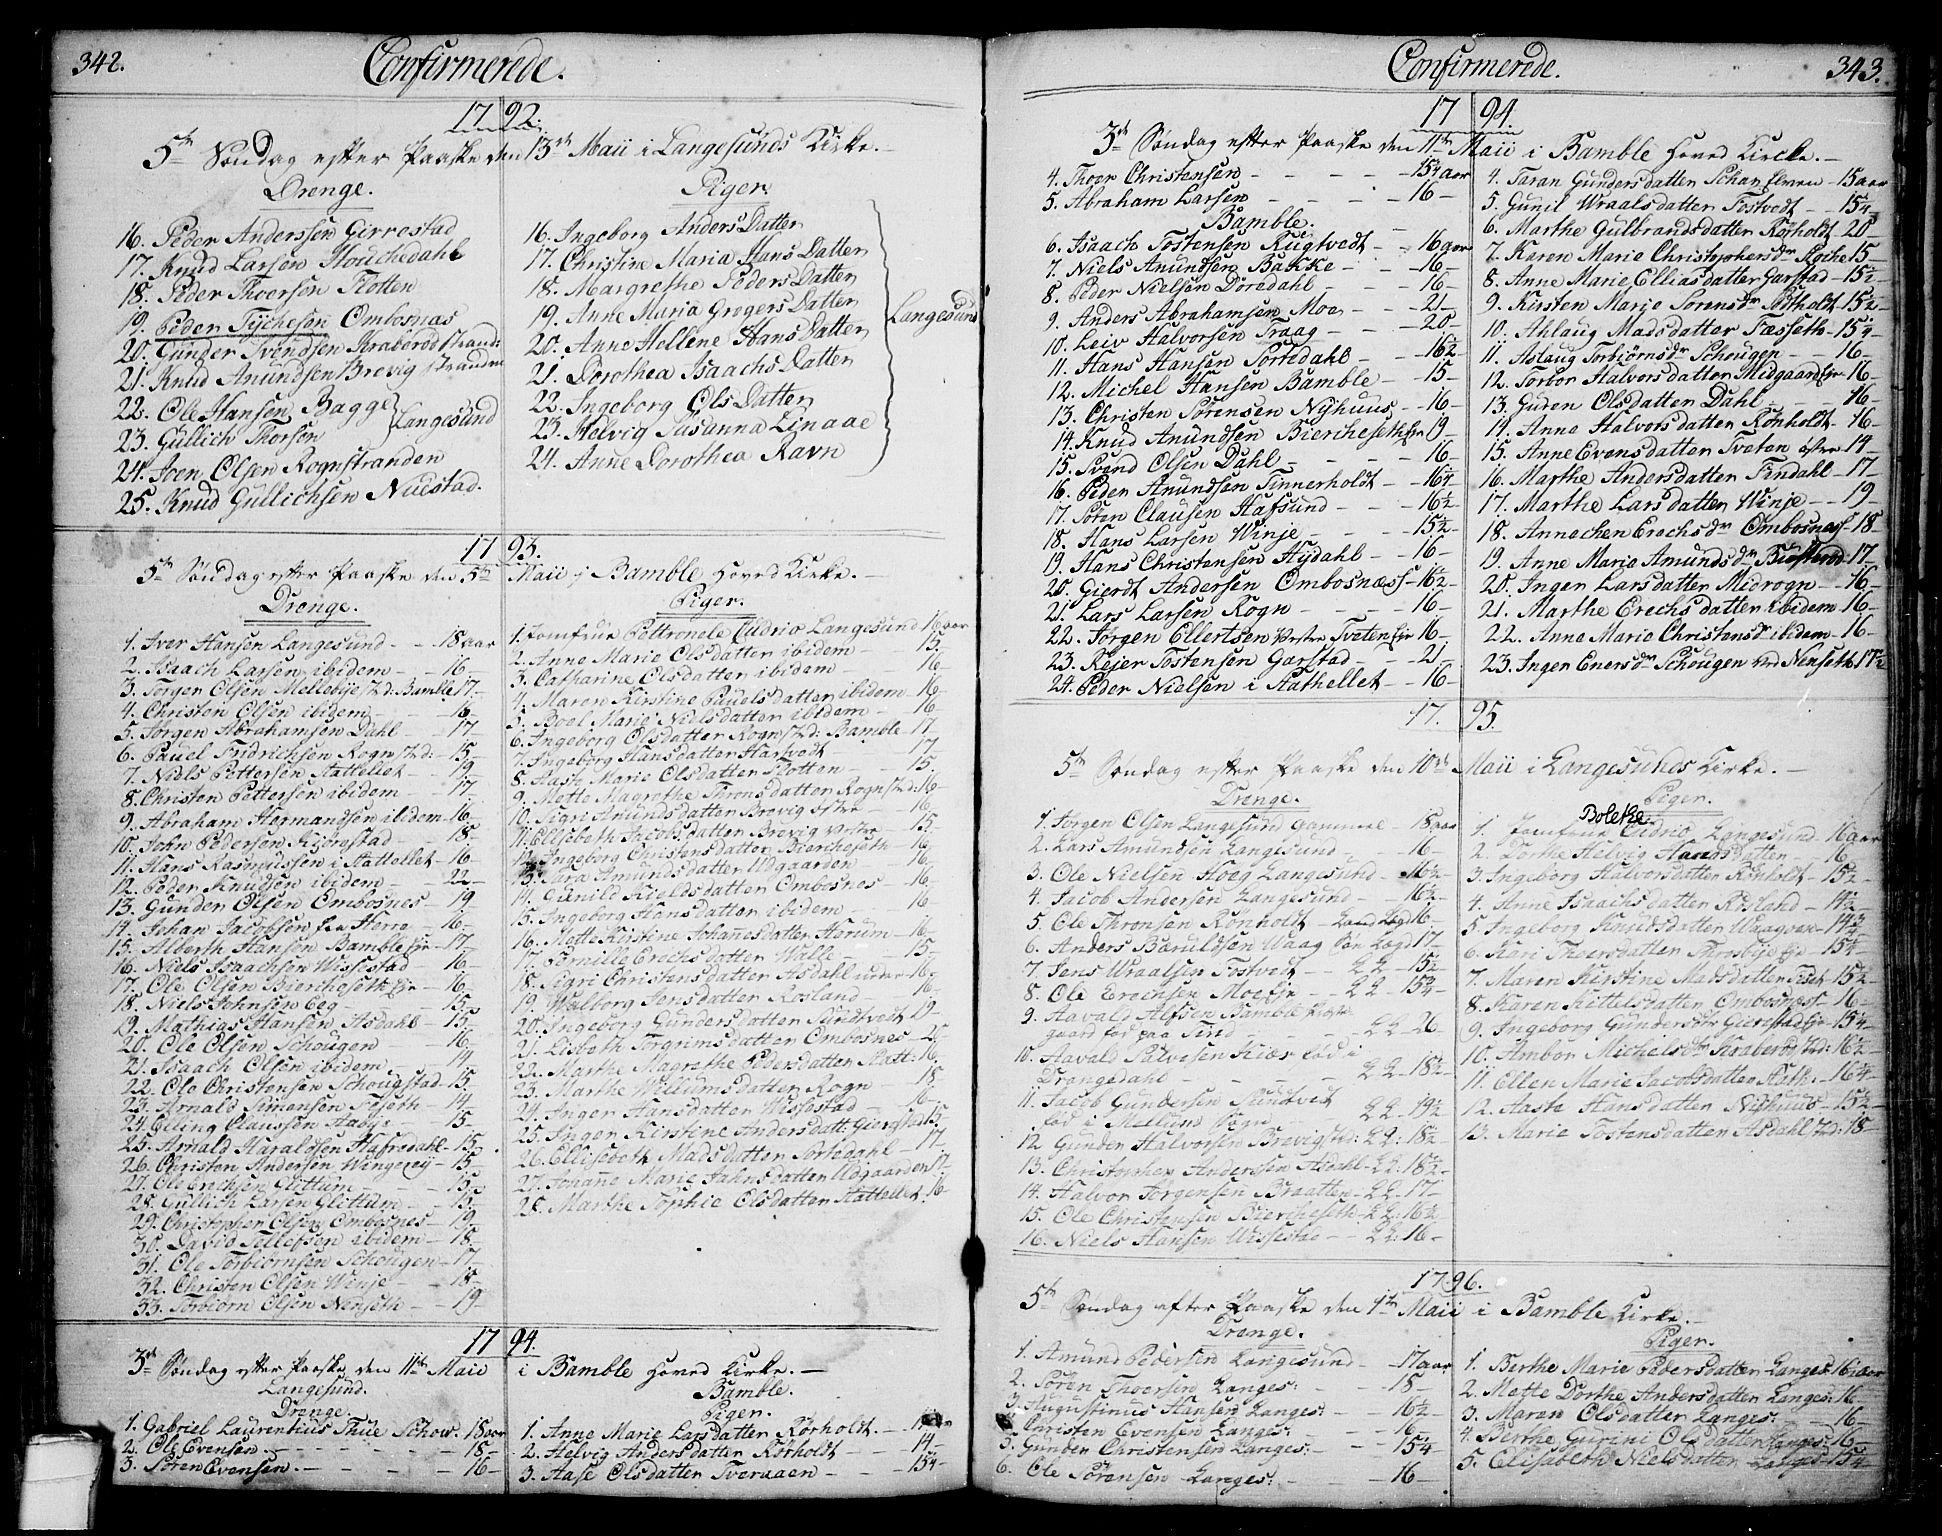 SAKO, Bamble kirkebøker, F/Fa/L0002: Ministerialbok nr. I 2, 1775-1814, s. 342-343